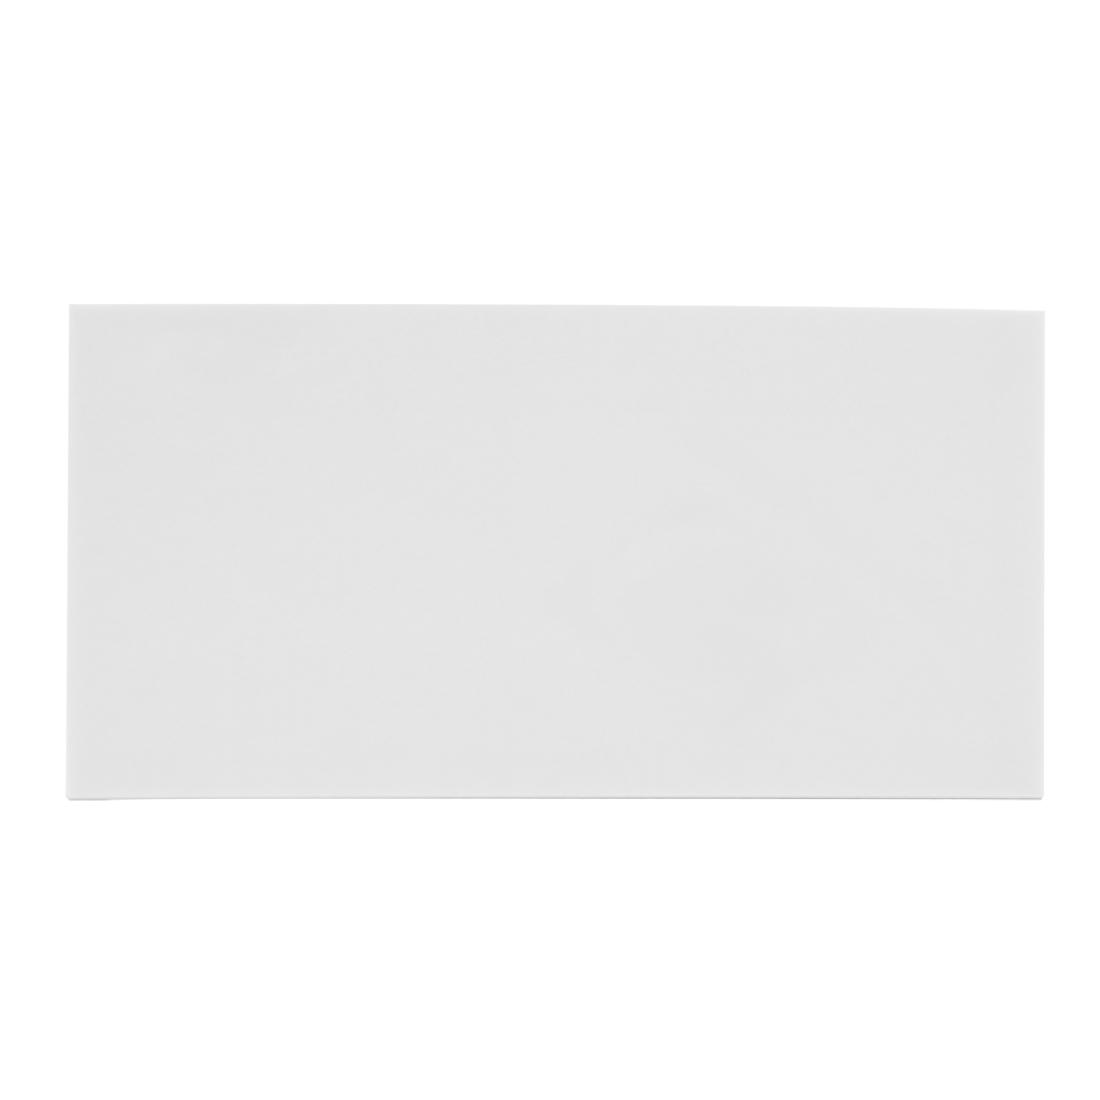 White Plastic Acrylic Plexiglass Sheet A4 Size 210mm x 297mm x 2mm